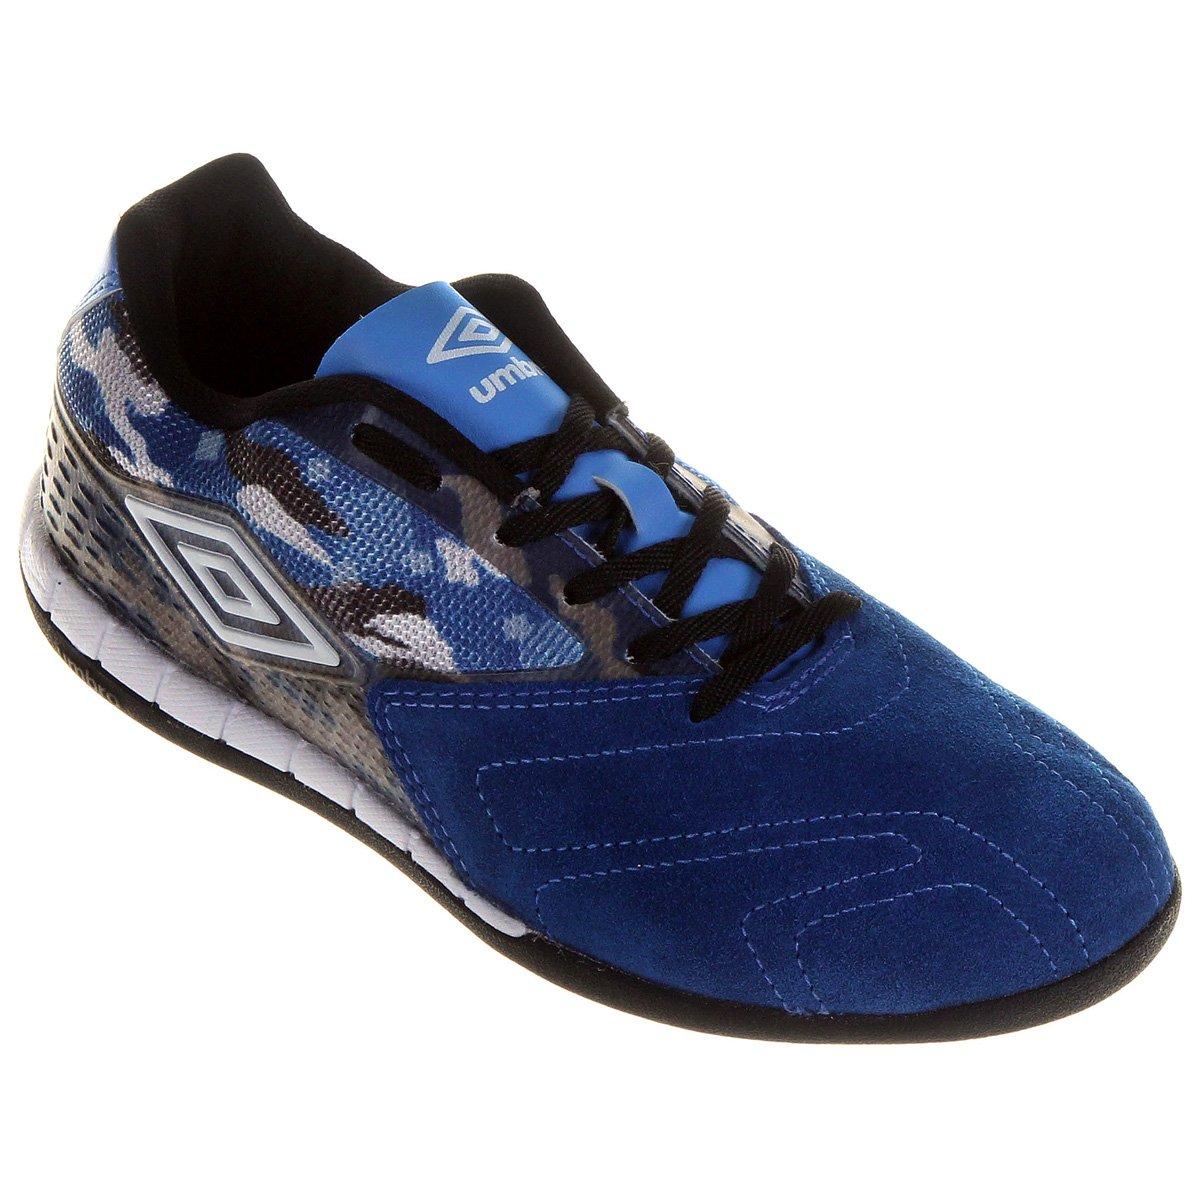 967c2ceebe Chuteira Futsal Umbro Trick Masculina - Compre Agora